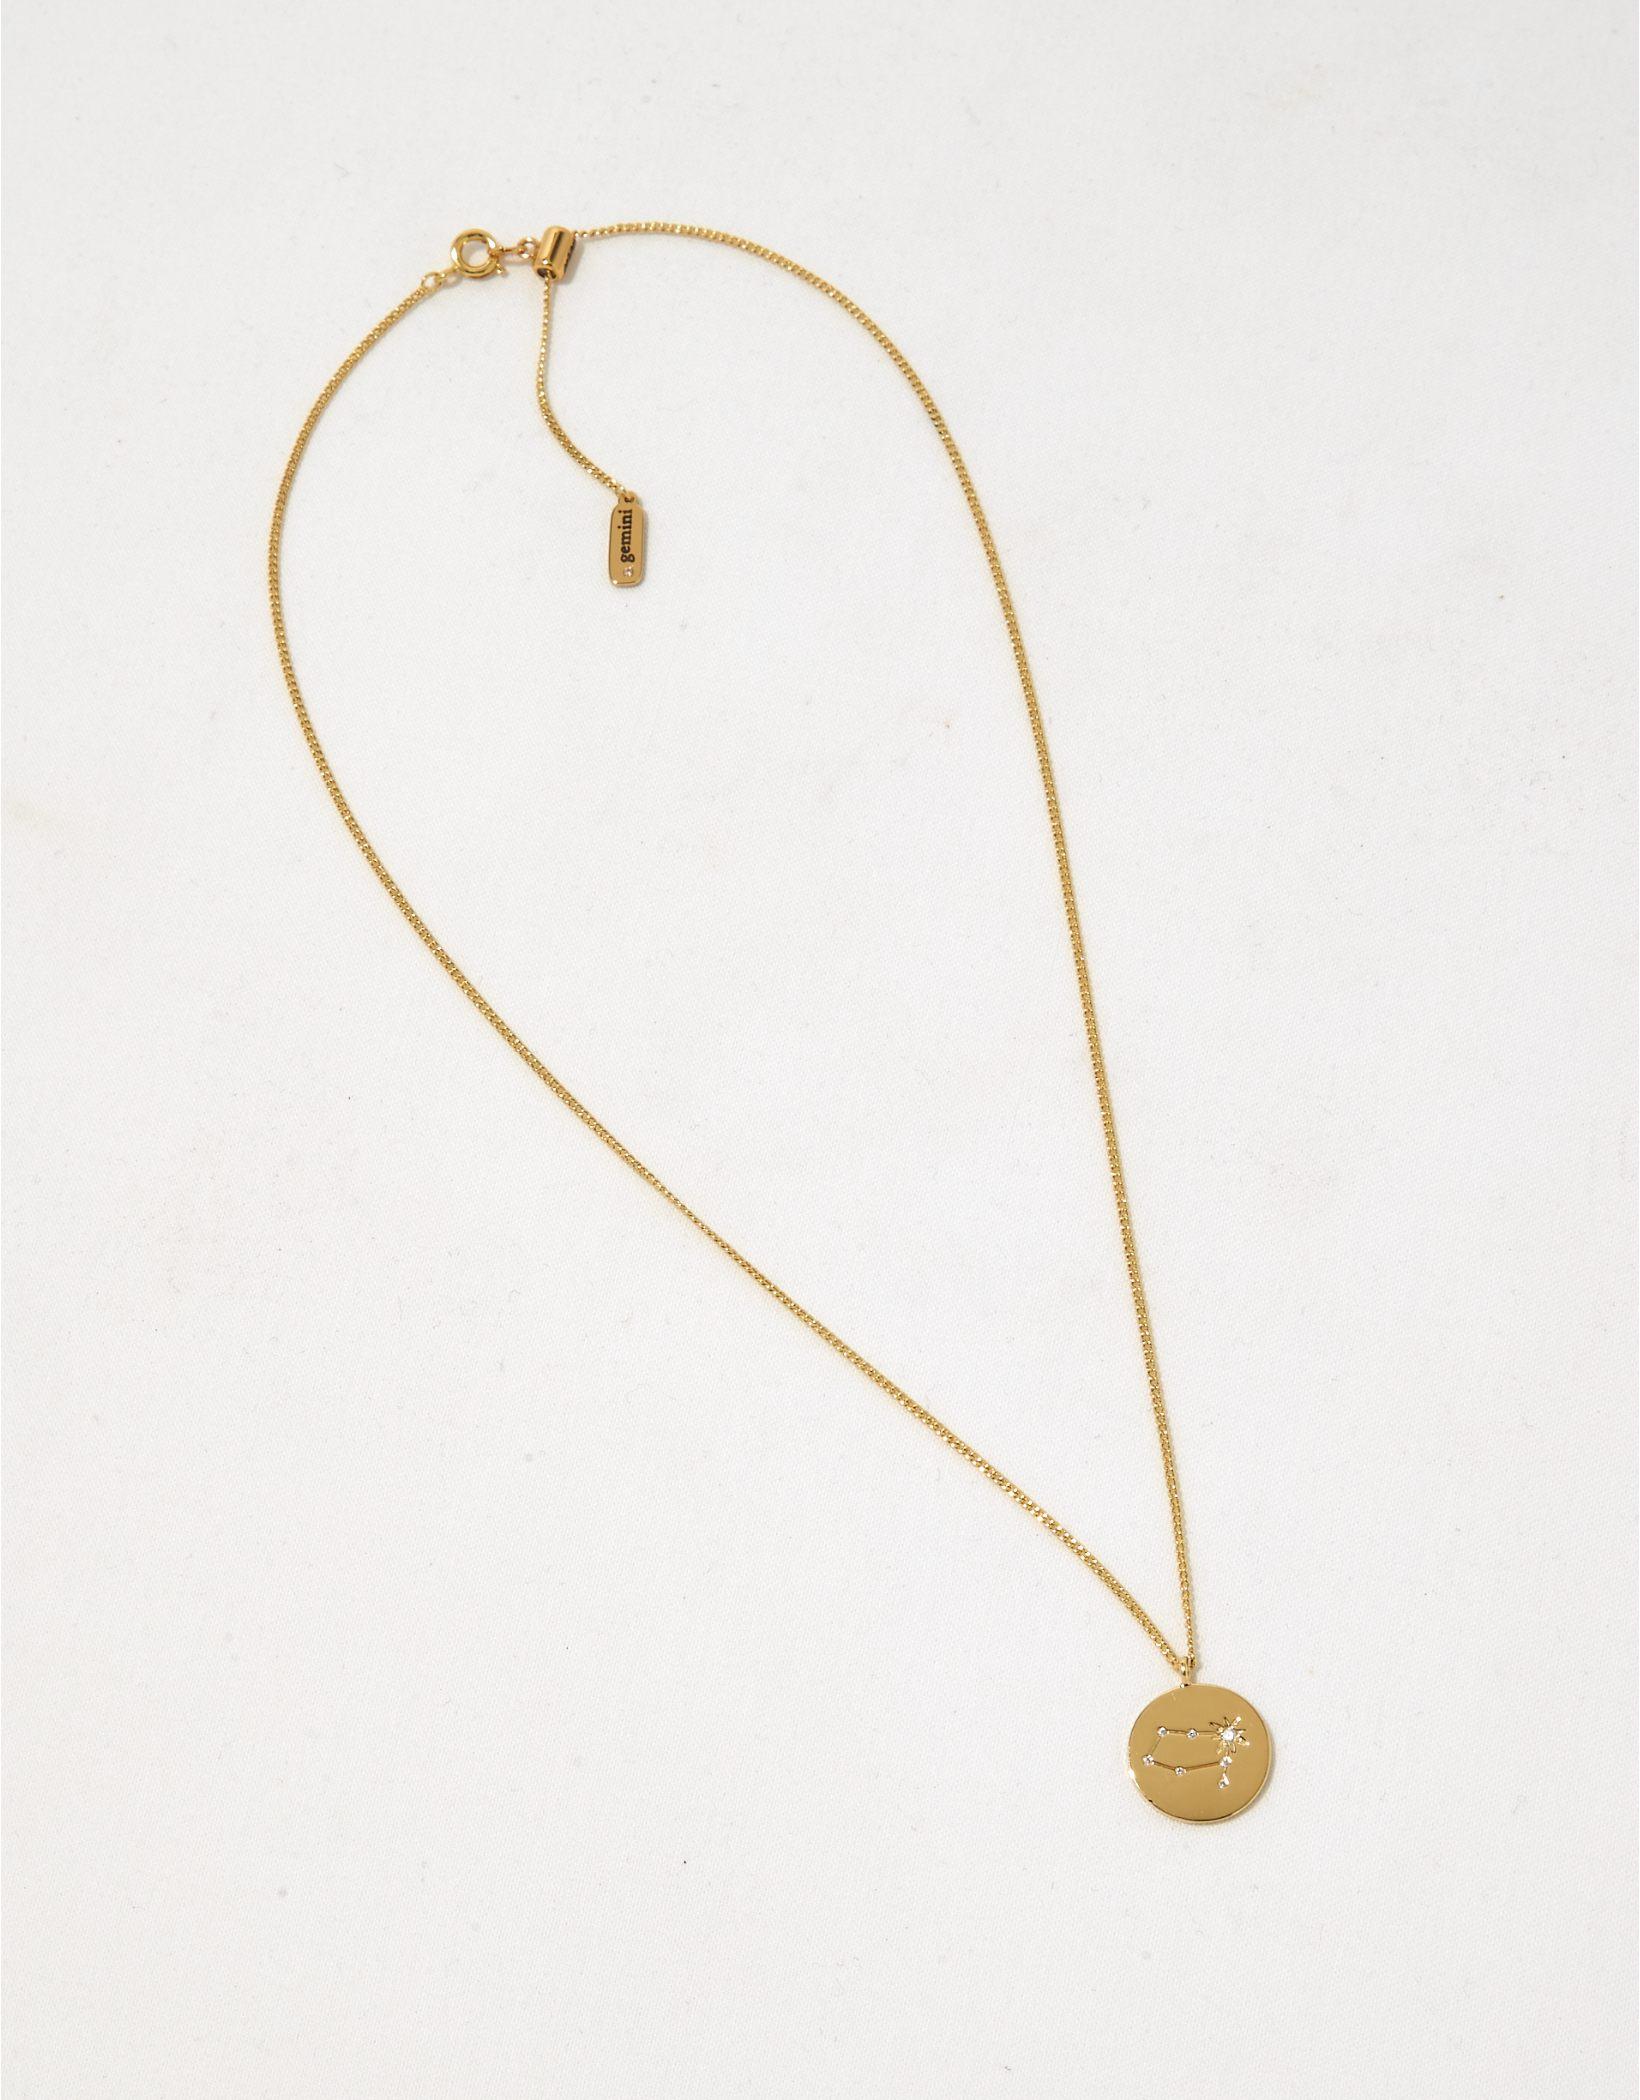 Aerie Zodiac Necklace